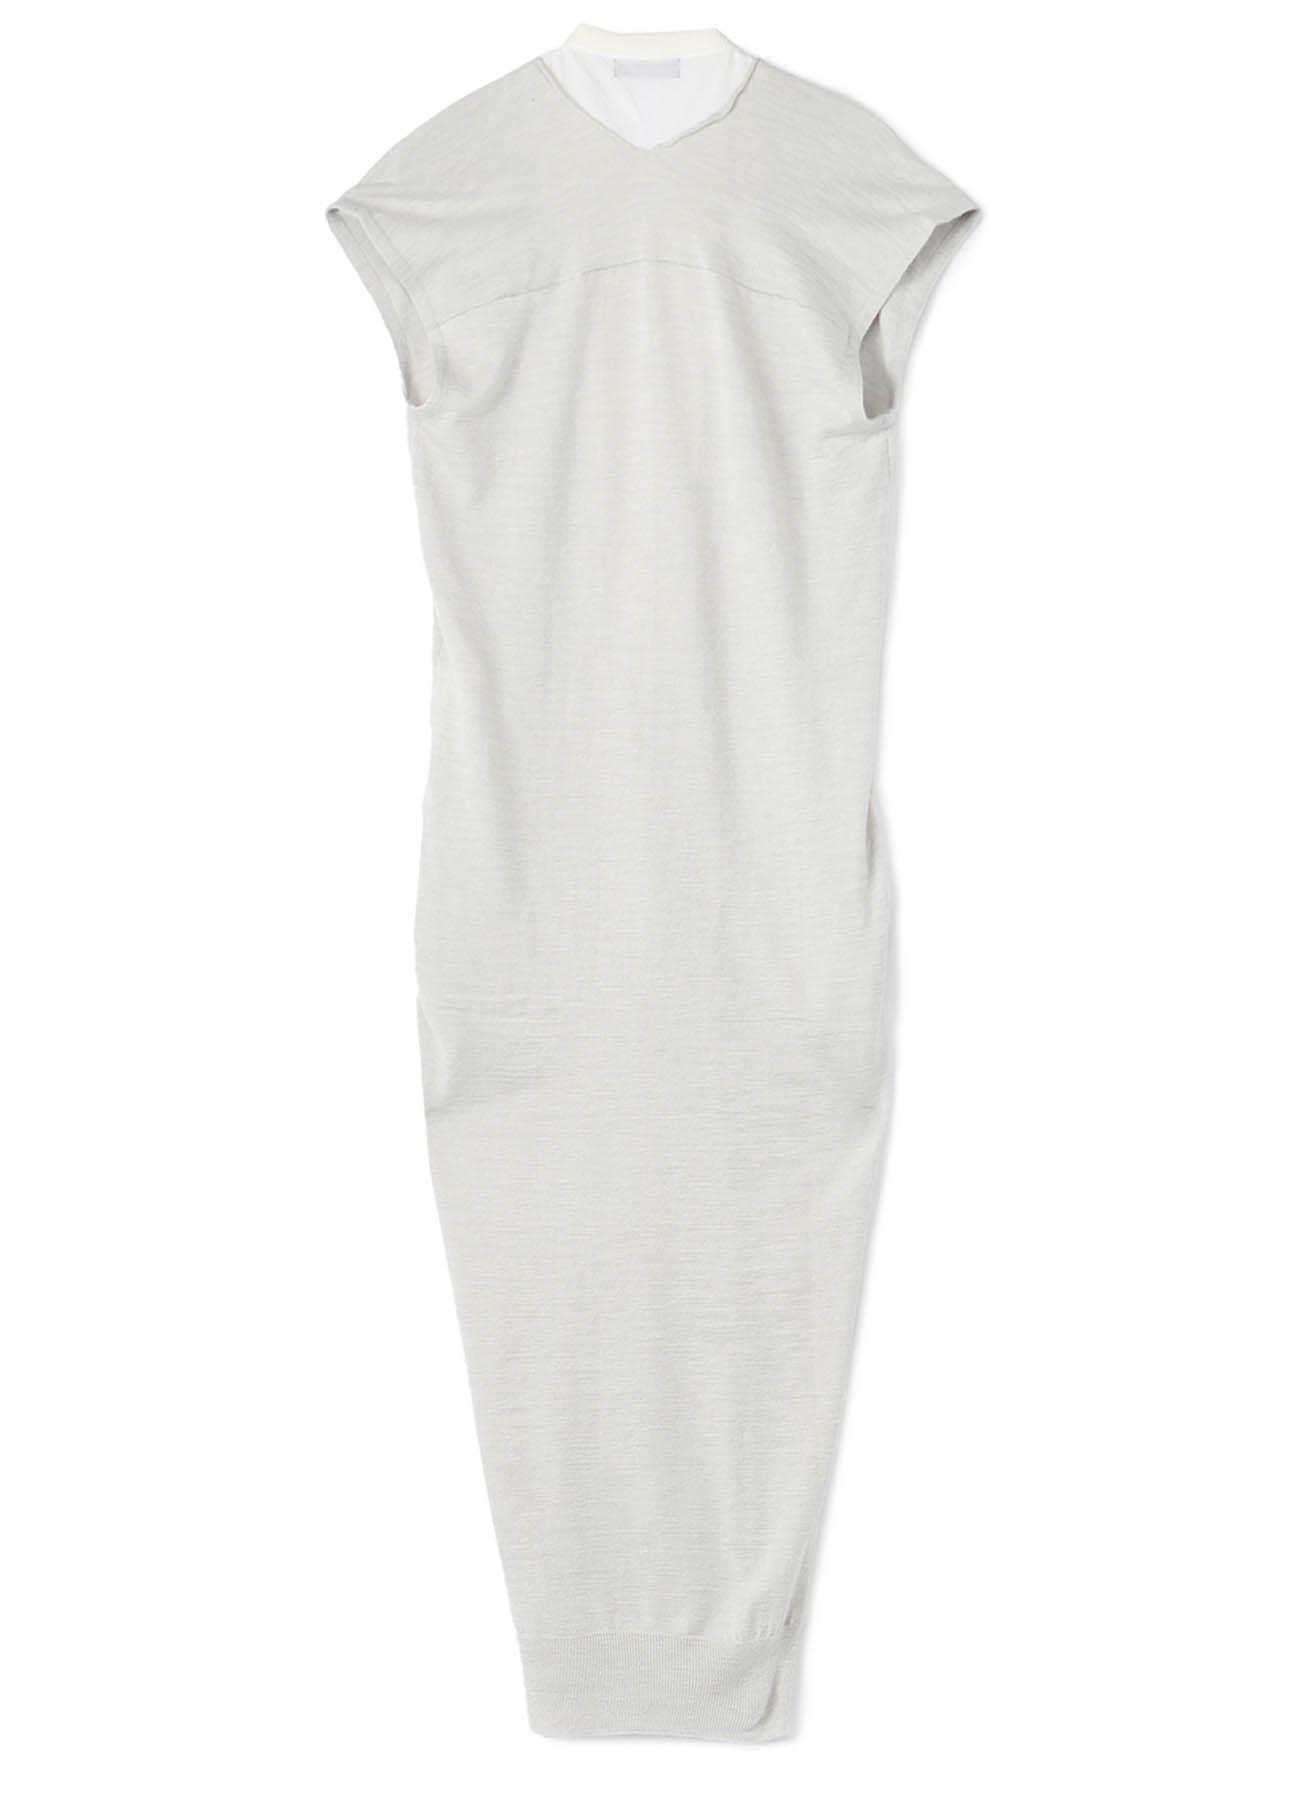 2/34Ry/Ny/Li12G1P PLAIN STITCH LAYER STYLE NO SLEEVE DRESS